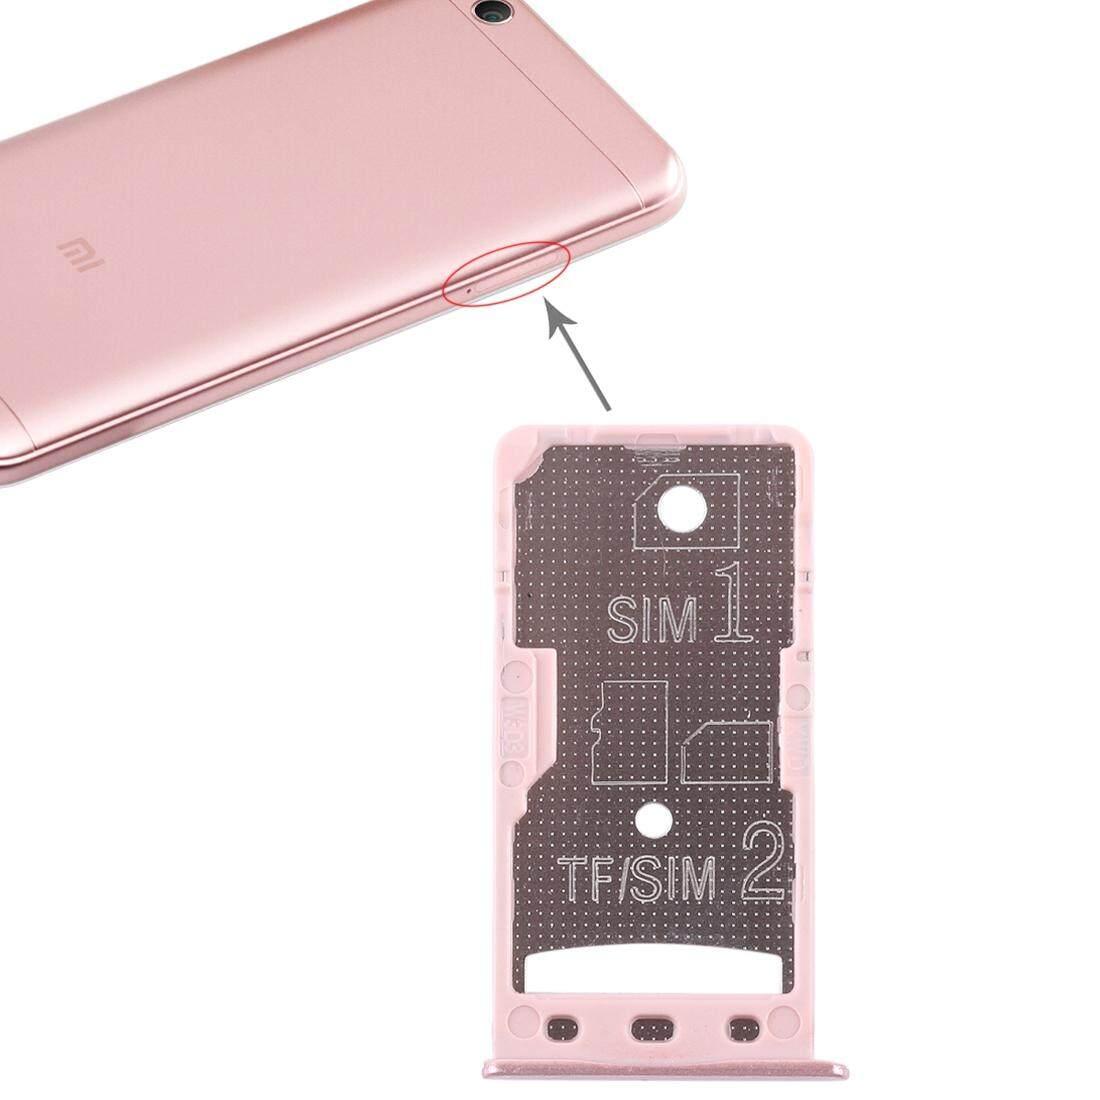 2 Kartu SIM/Micro Tray SD Card untuk Xiaomi Redmi 5A (Mawar Emas)